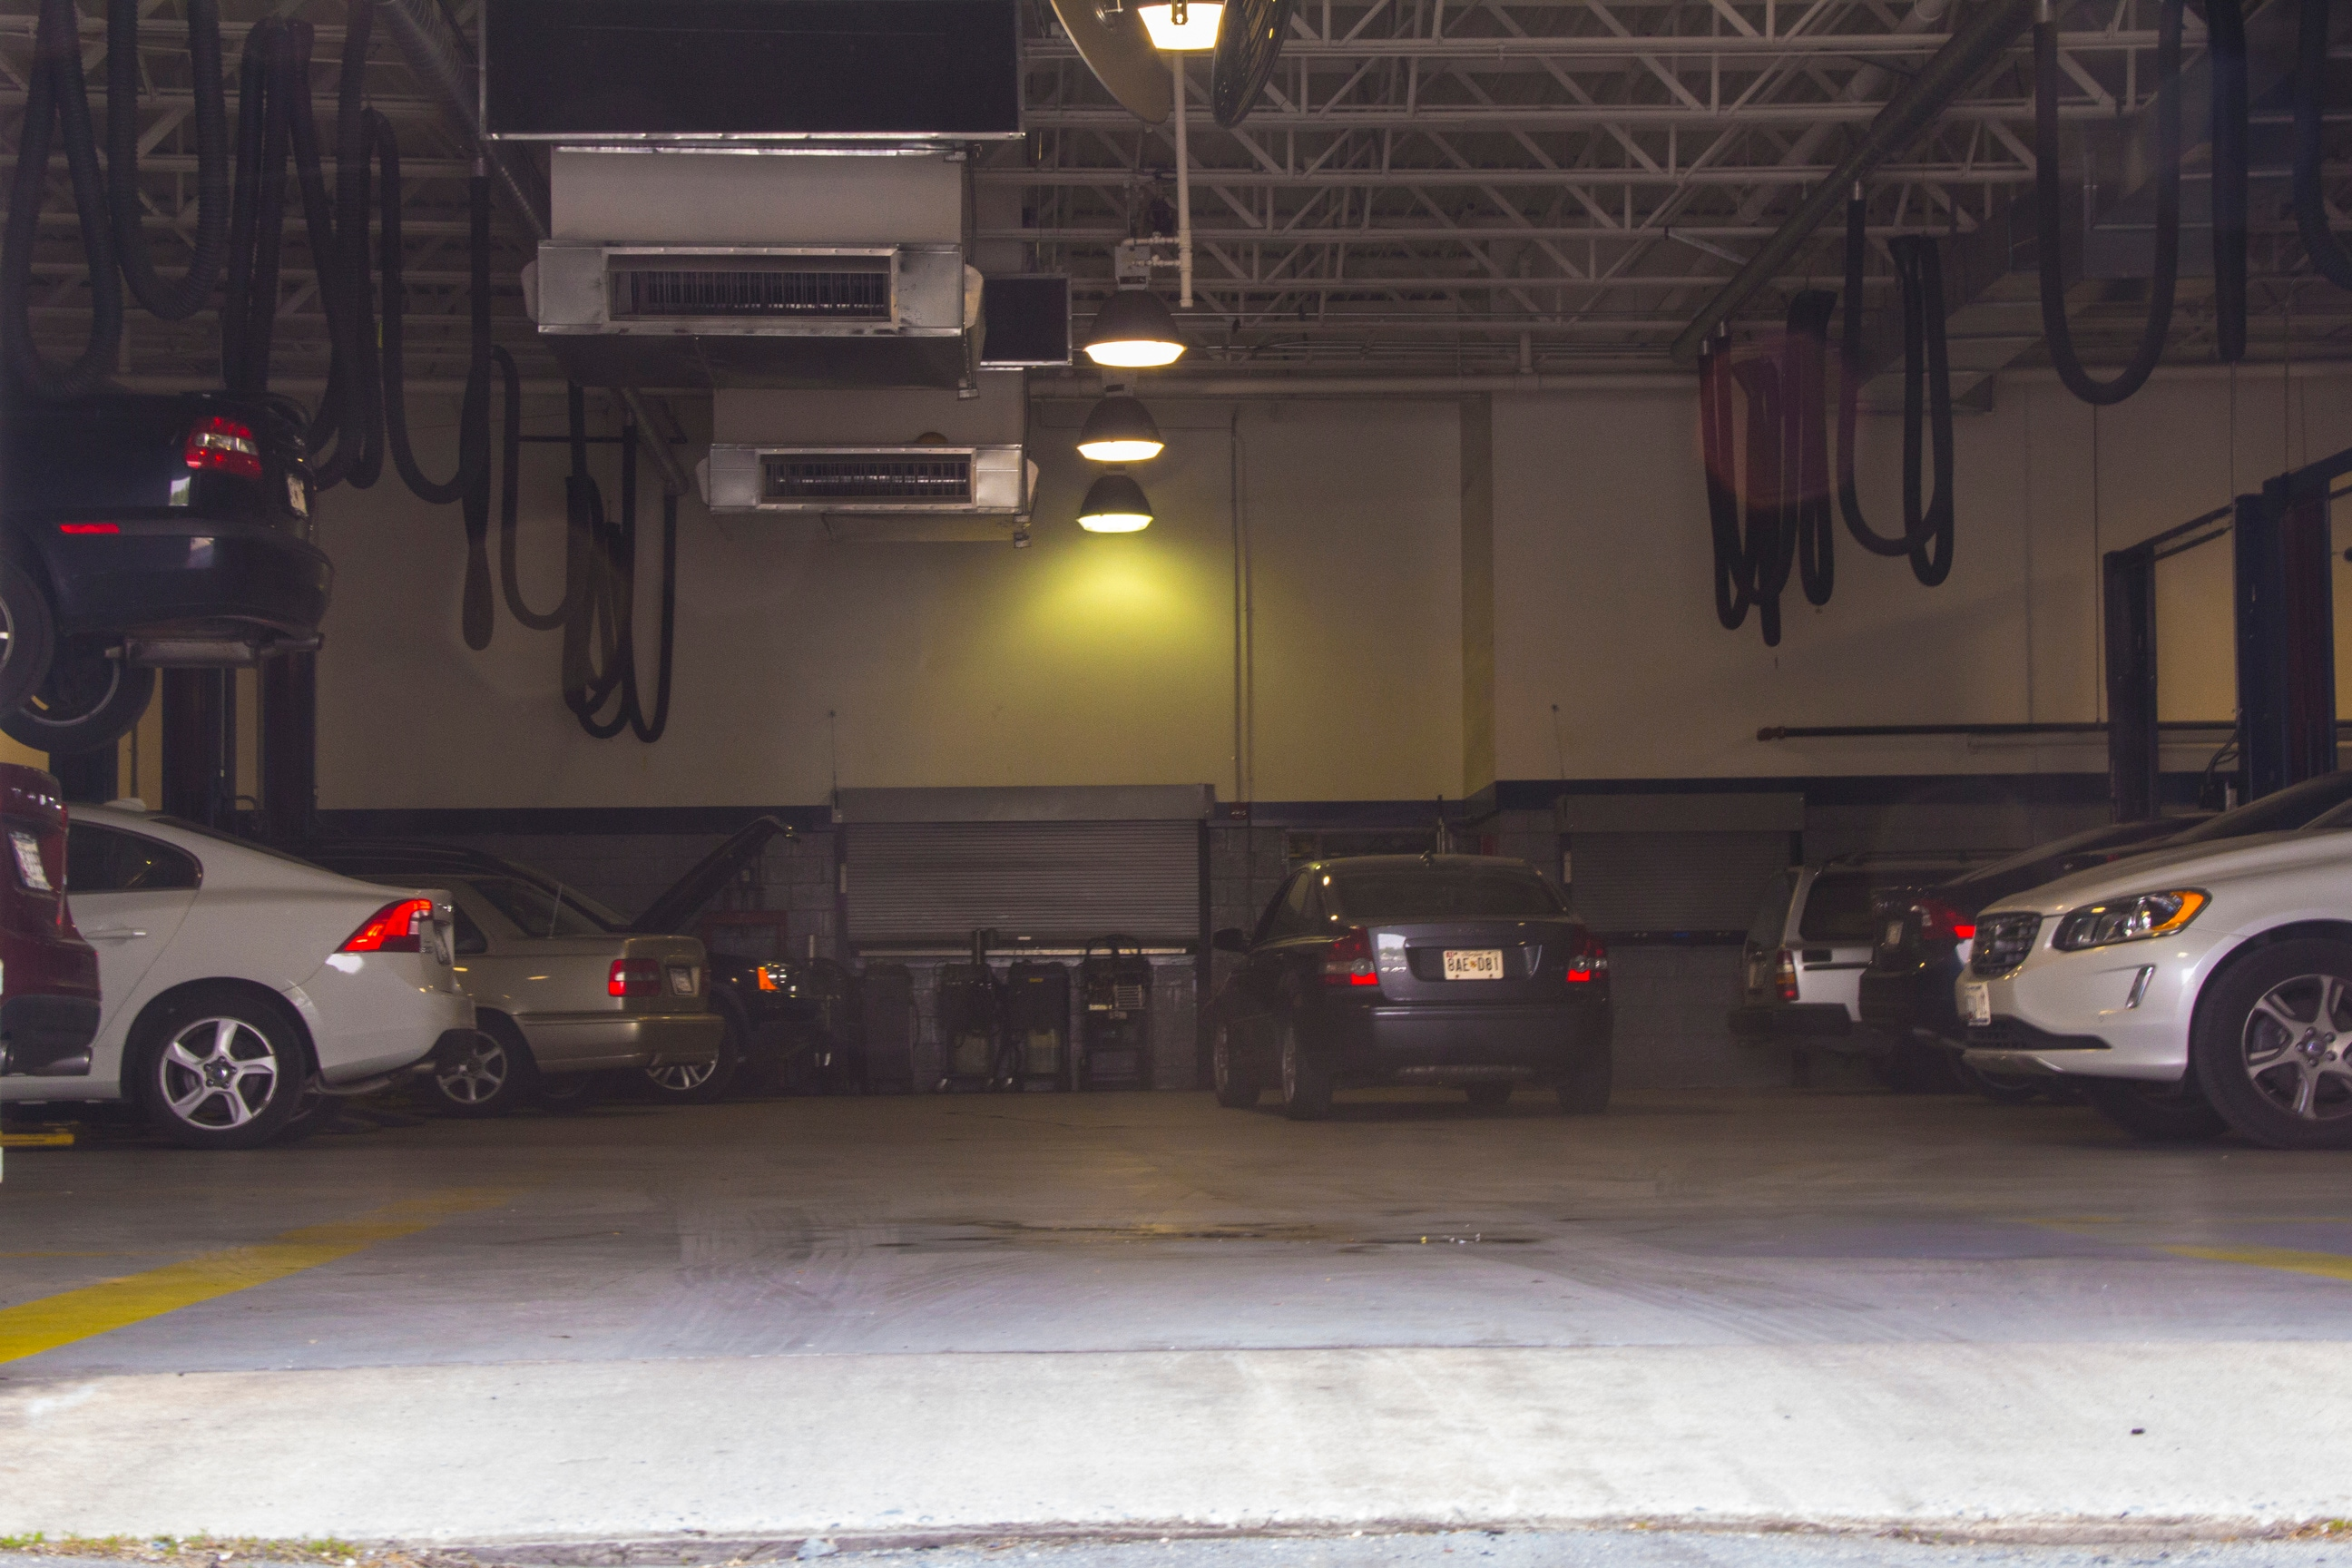 Volvo Service & Repair in Rockville, MD | DARCARS Volvo of Rockville Auto Service Center